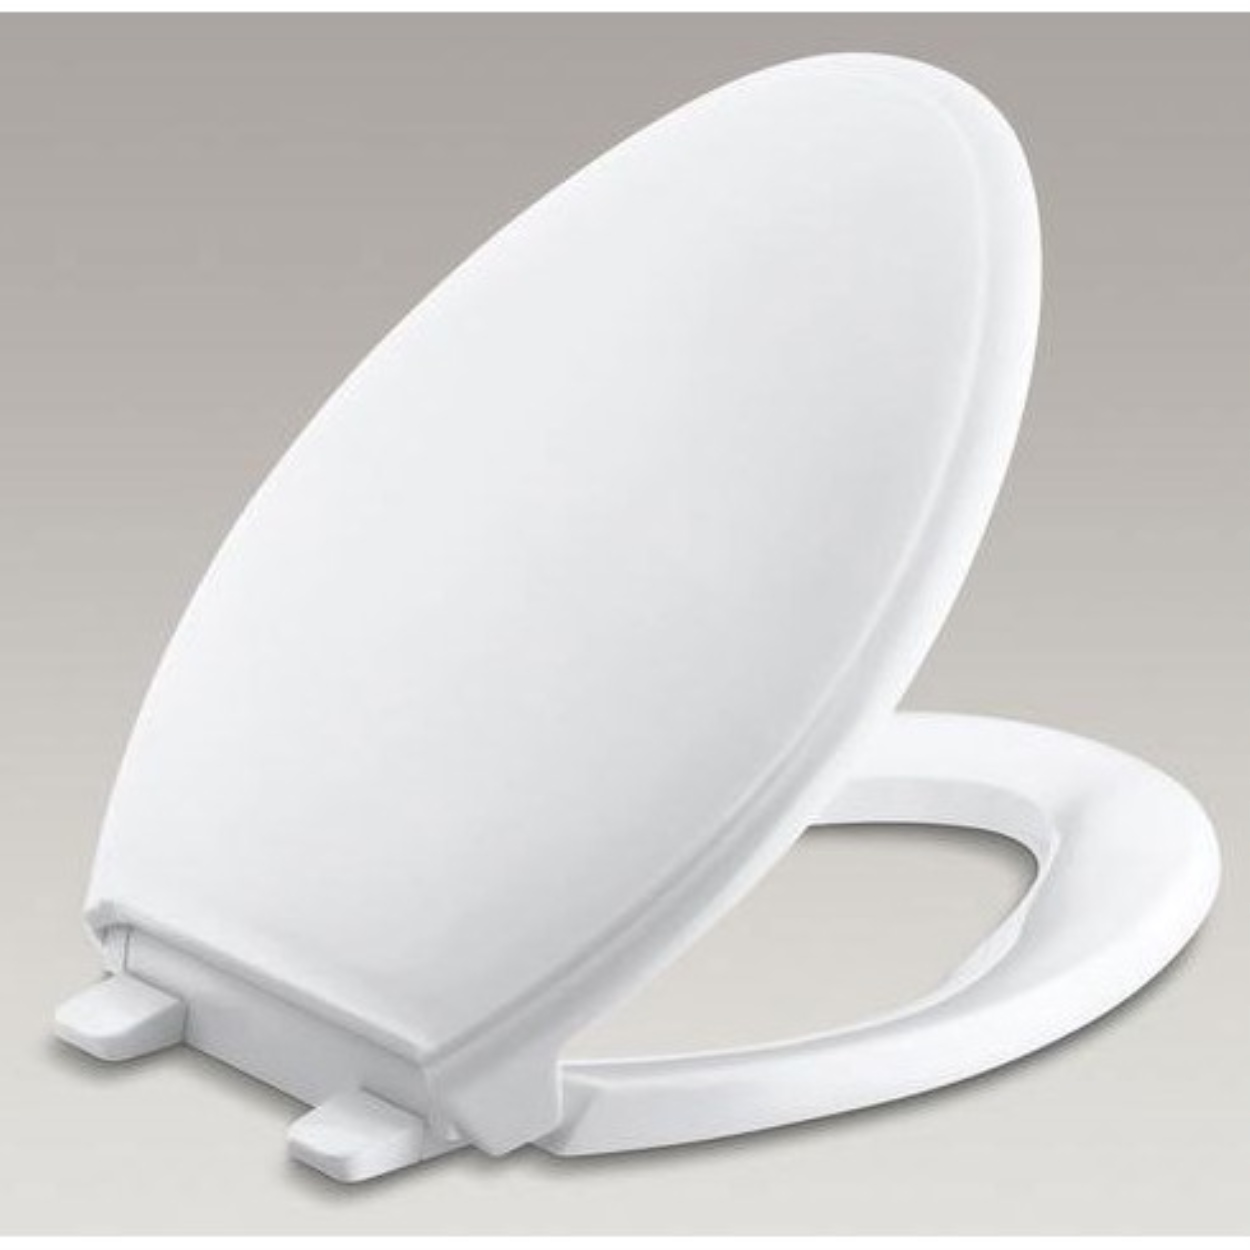 Toilet Seat Cover Vshape, Bathroom Seat Cover